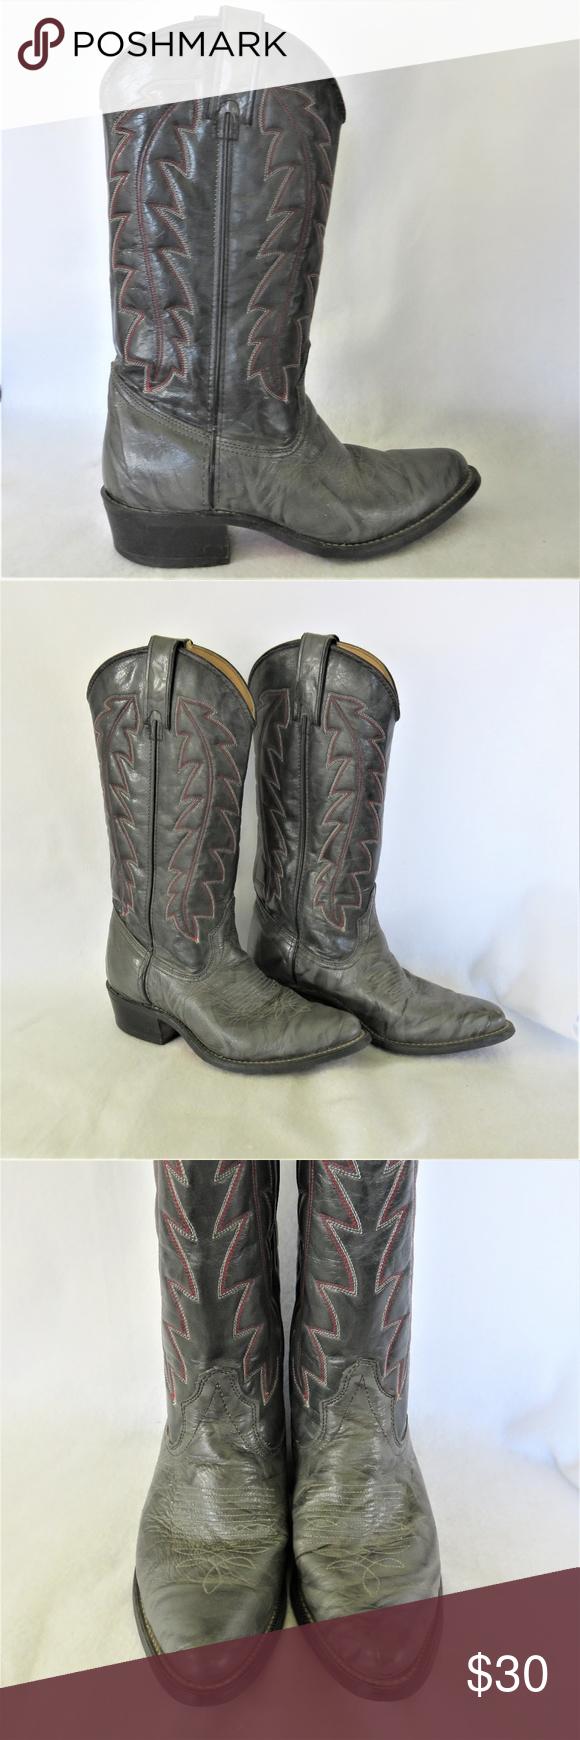 6fa9cdbfacc Wrangler Men's 6.5 EE Western Boots A very nice pair of Wrangler ...